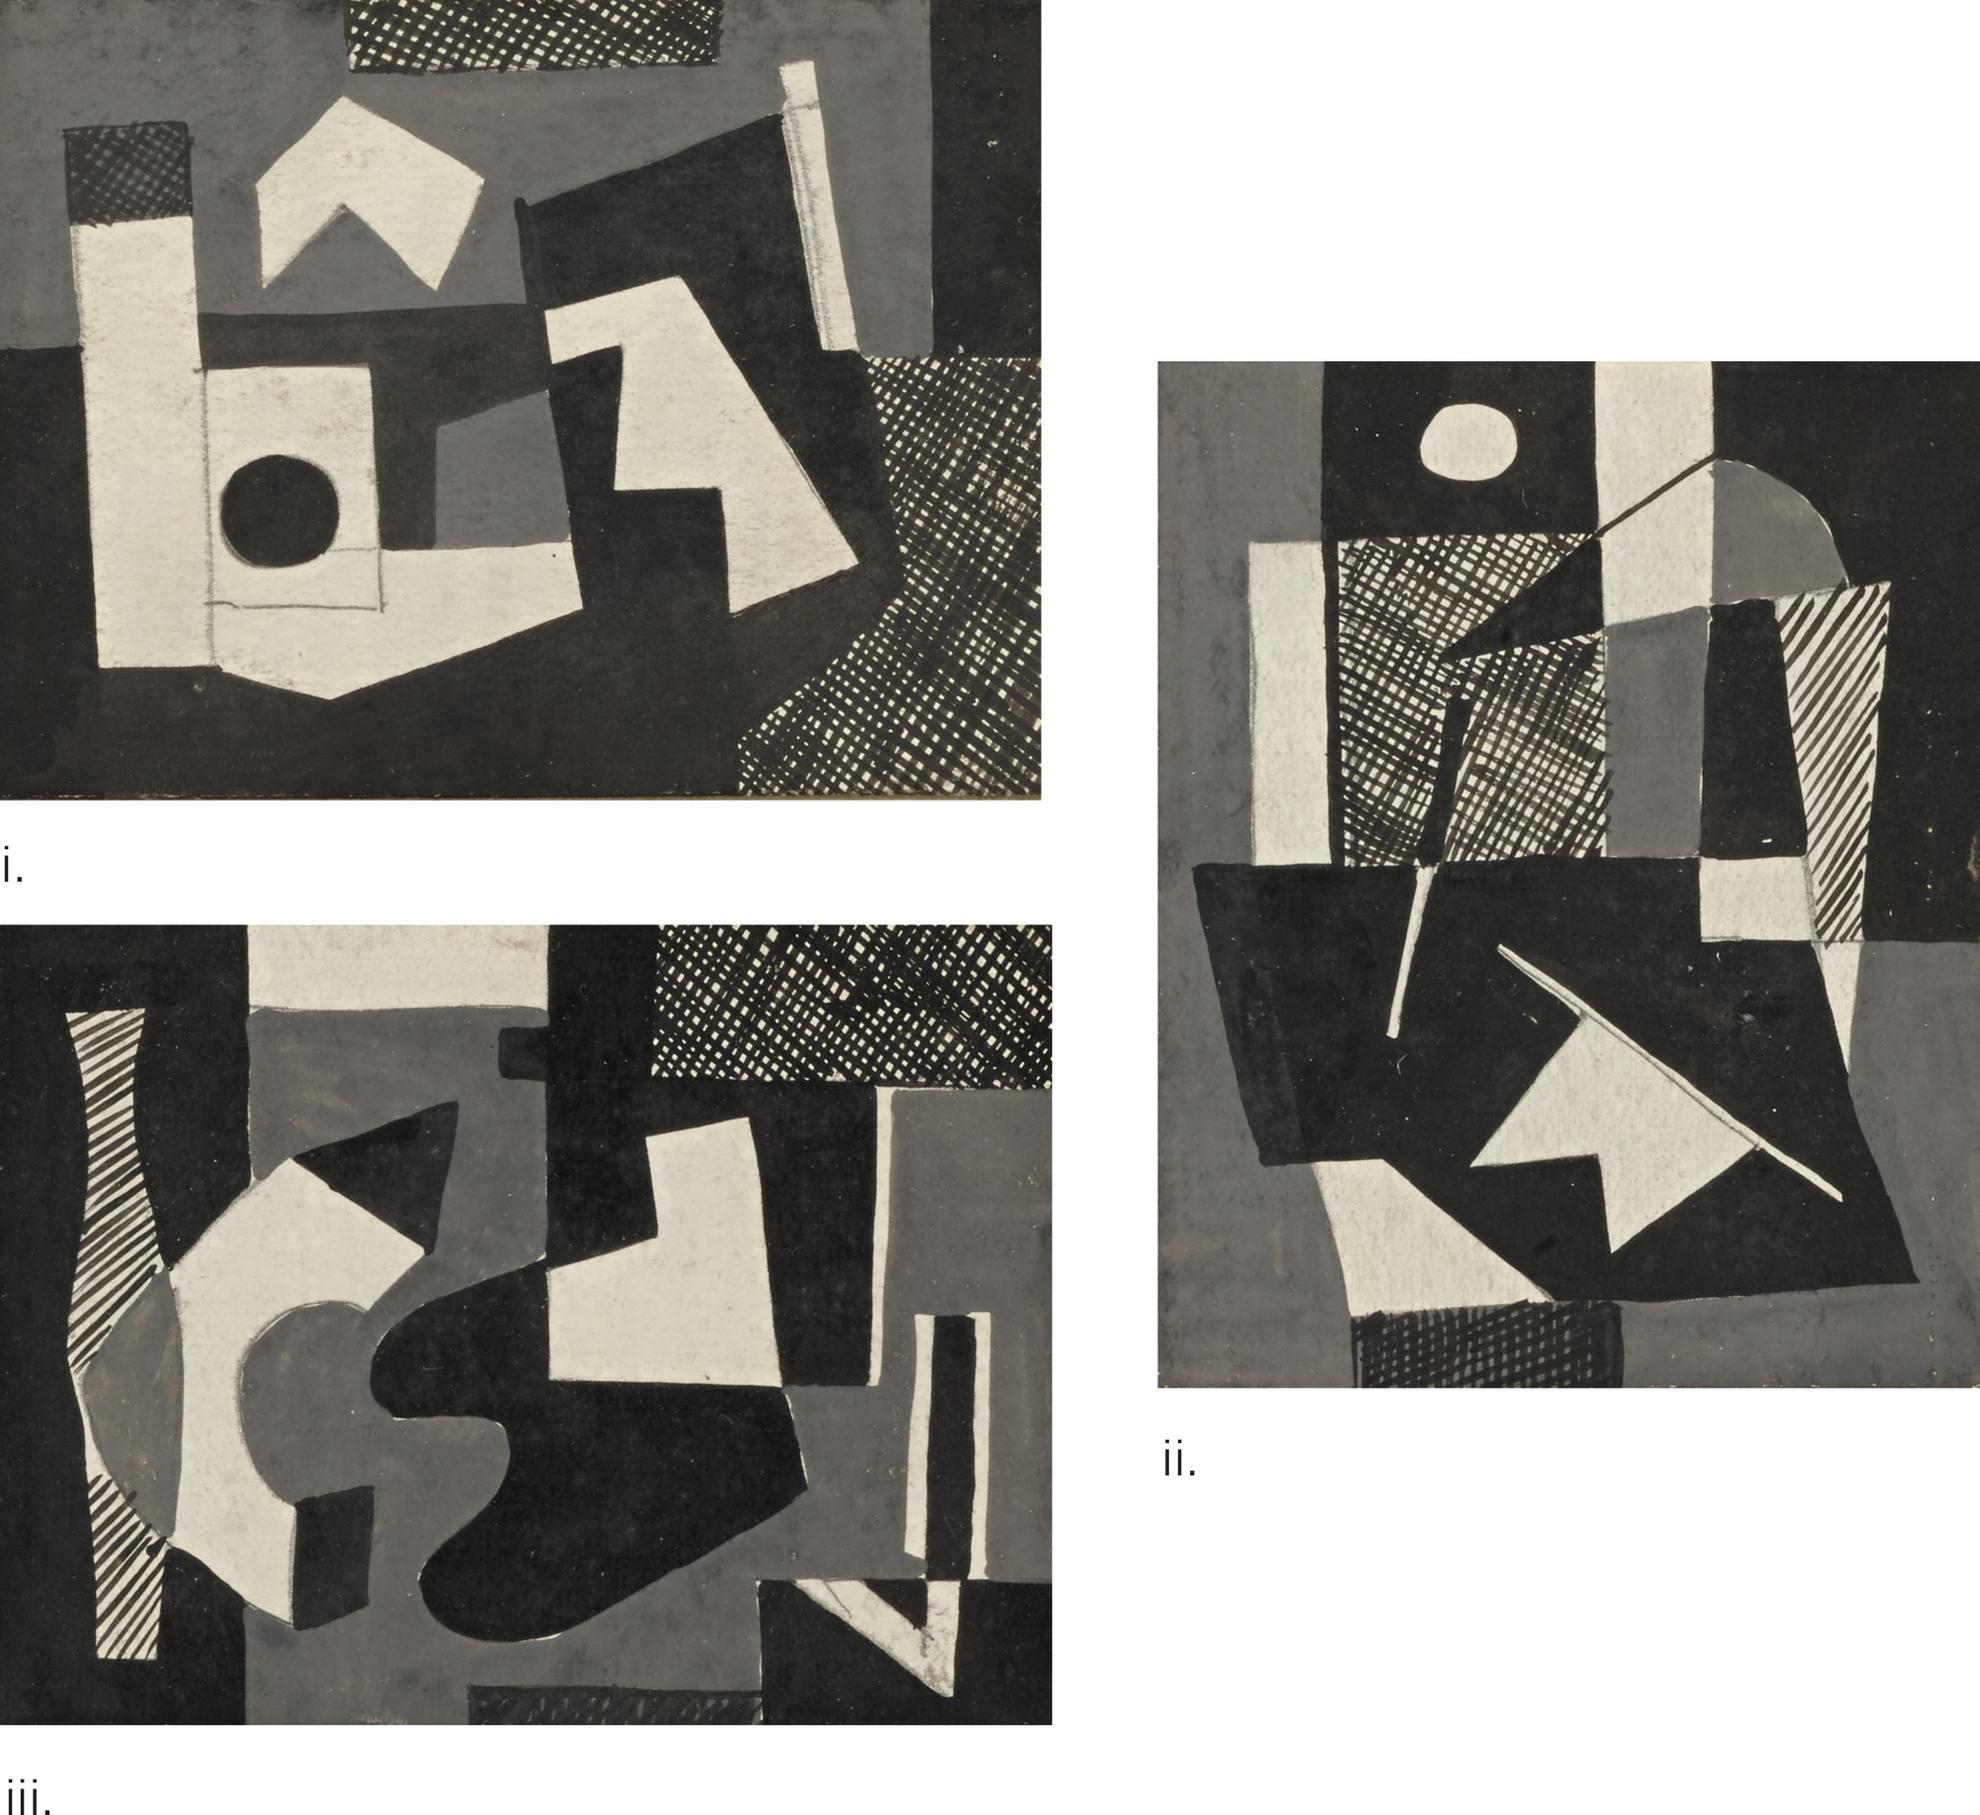 Vaclav Vytlacil-Untitled: Three Works-1940